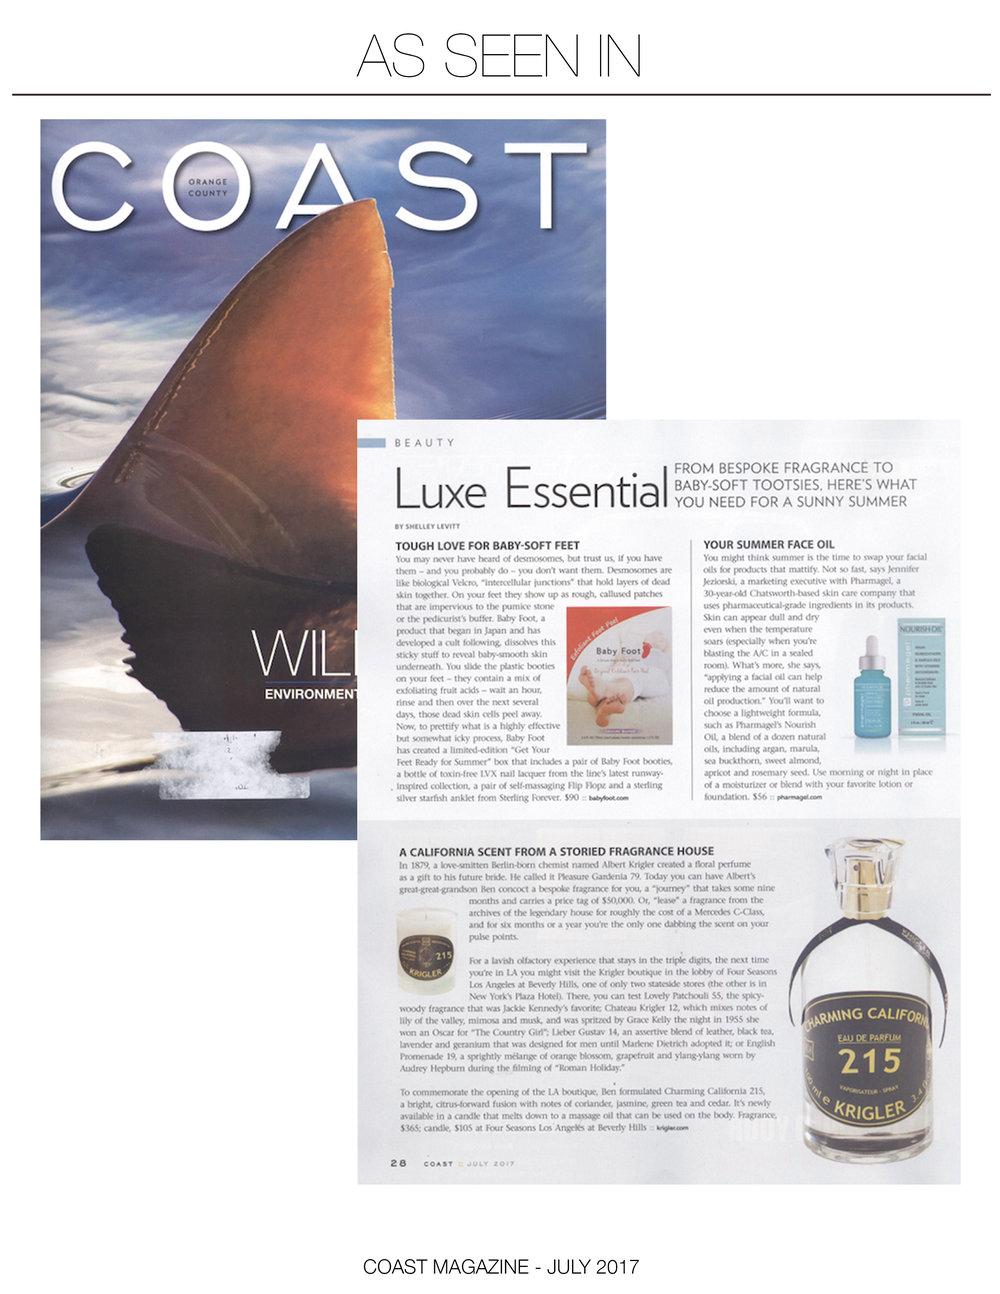 Pharmagel_CoastMagazine_July2017.jpg